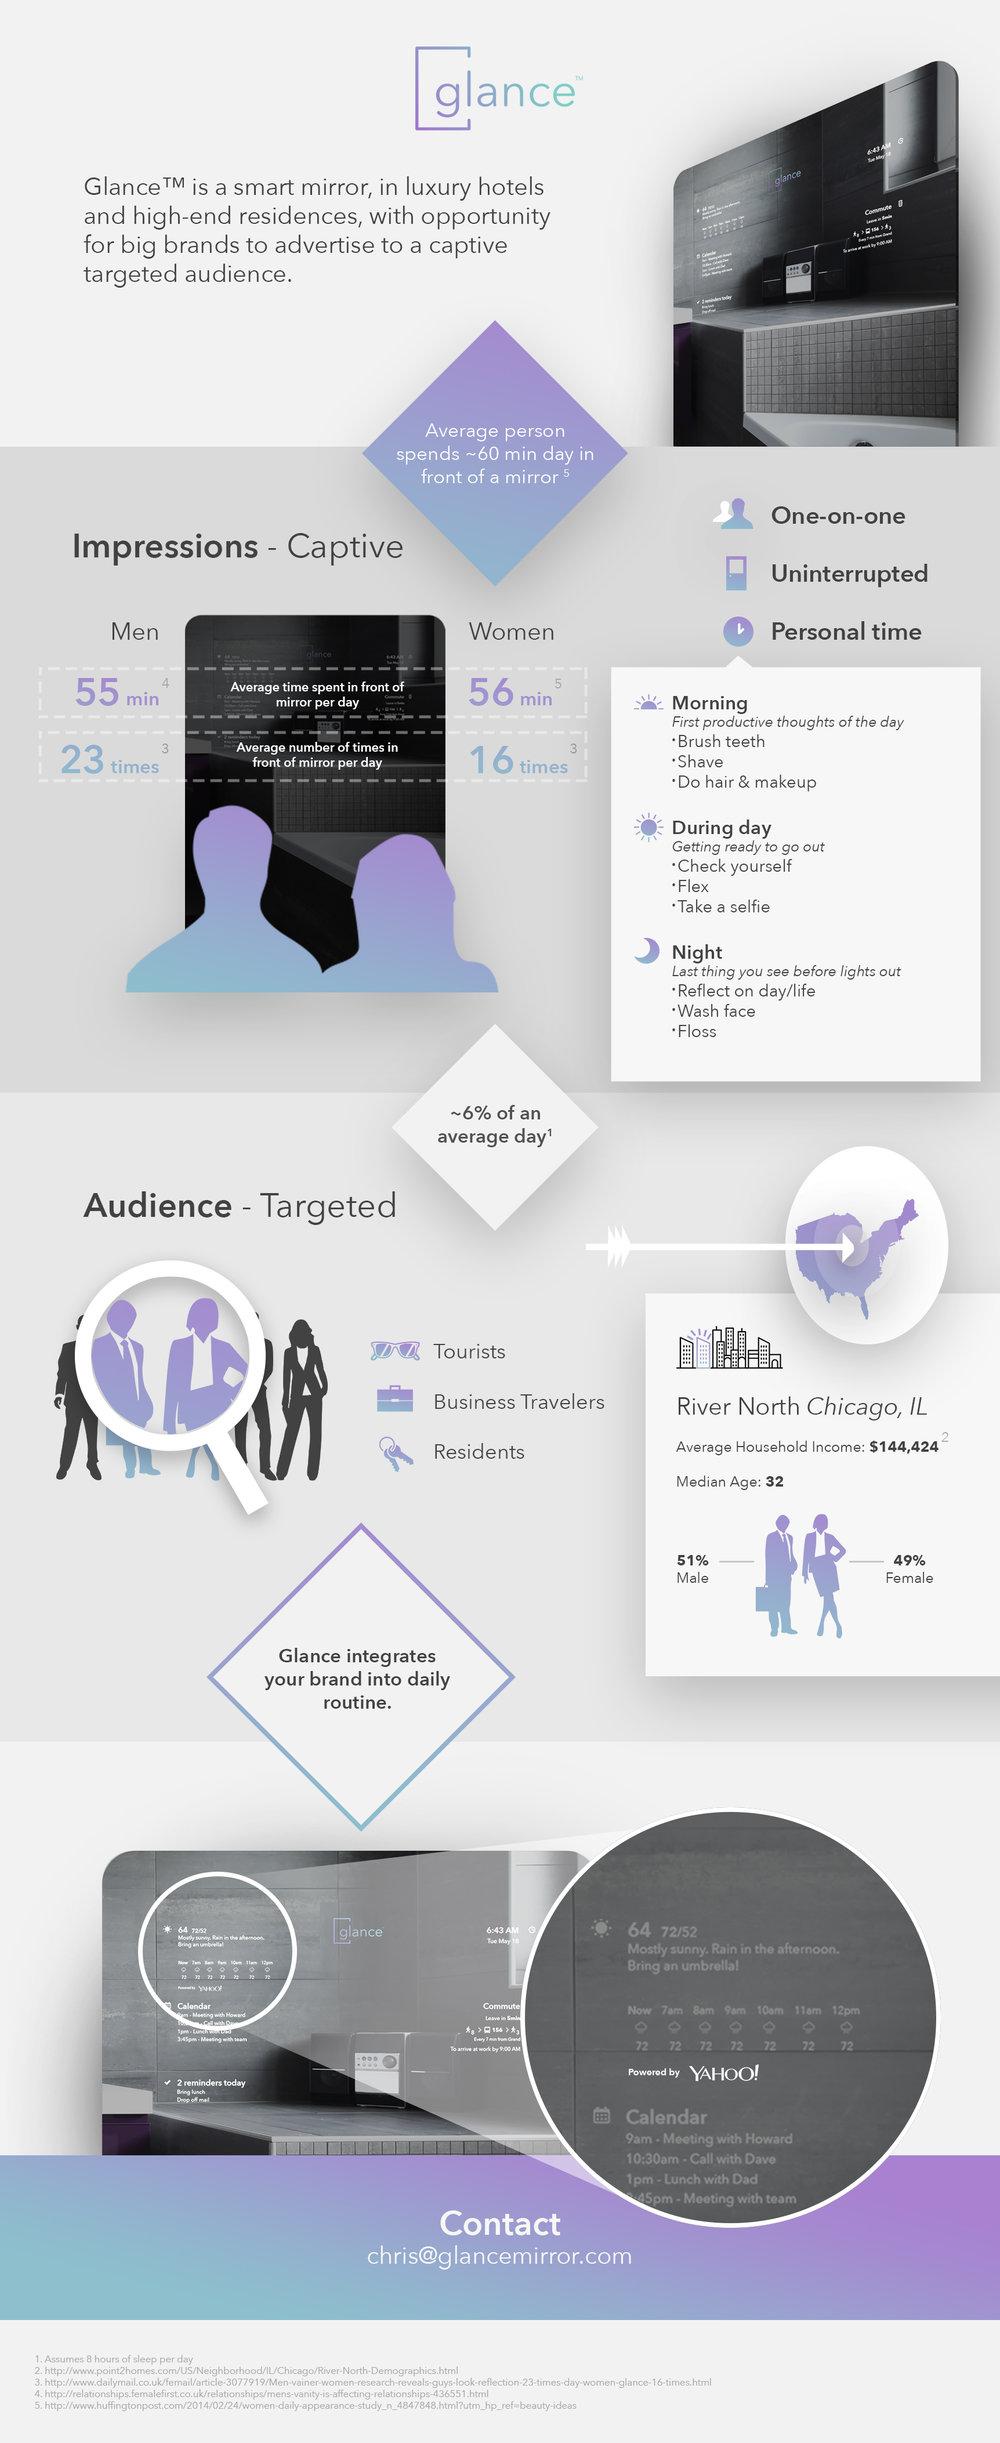 GlanceAd-infographic.jpg